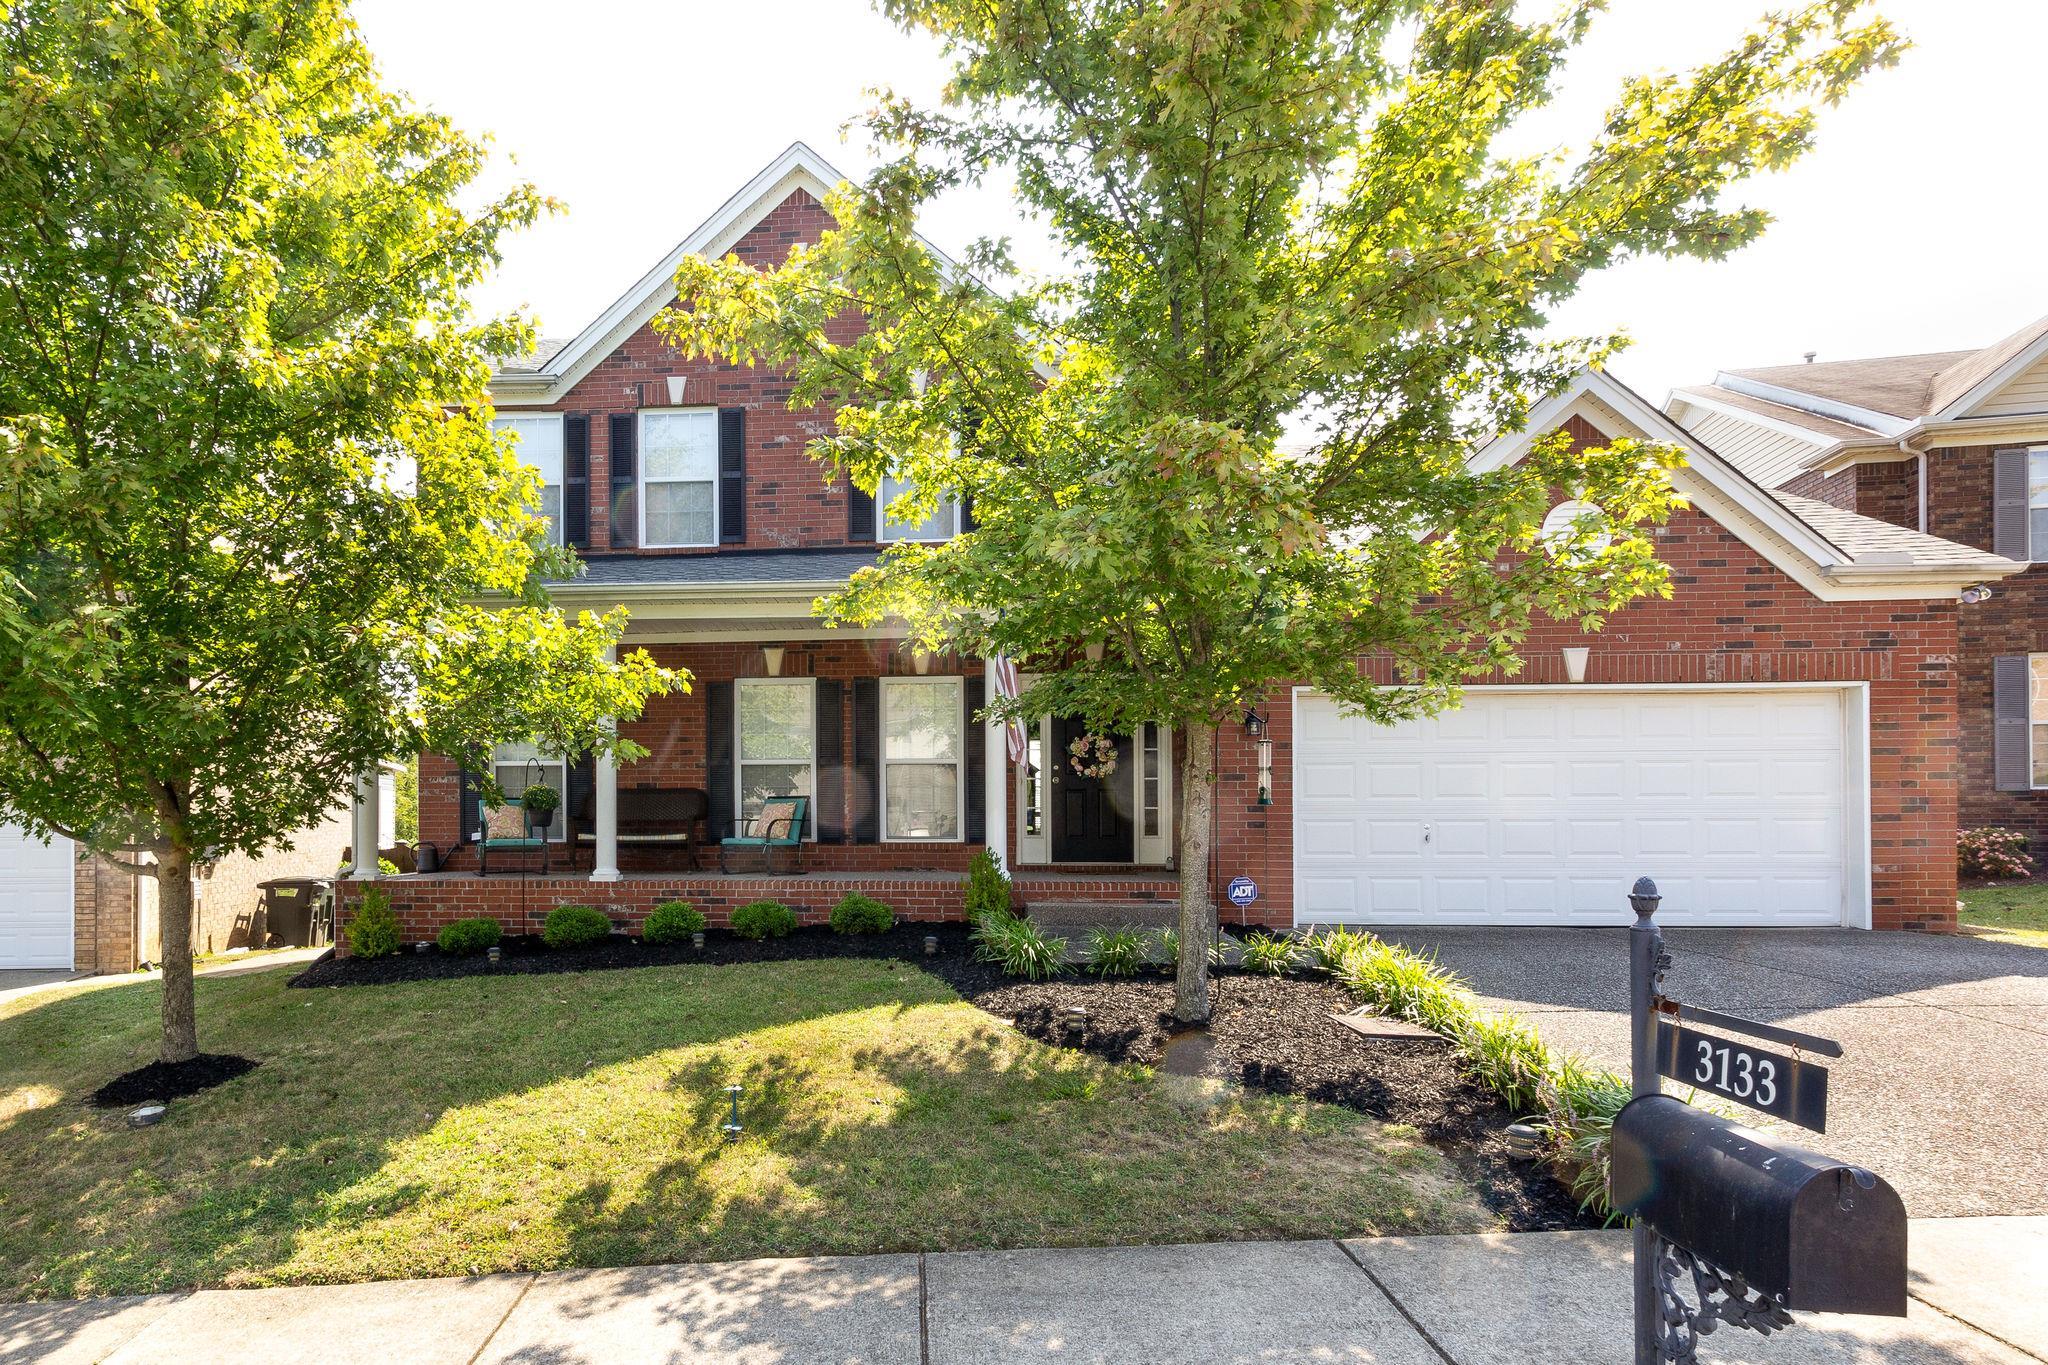 3133 Barnes Bend Dr, Nashville-Antioch, Tennessee